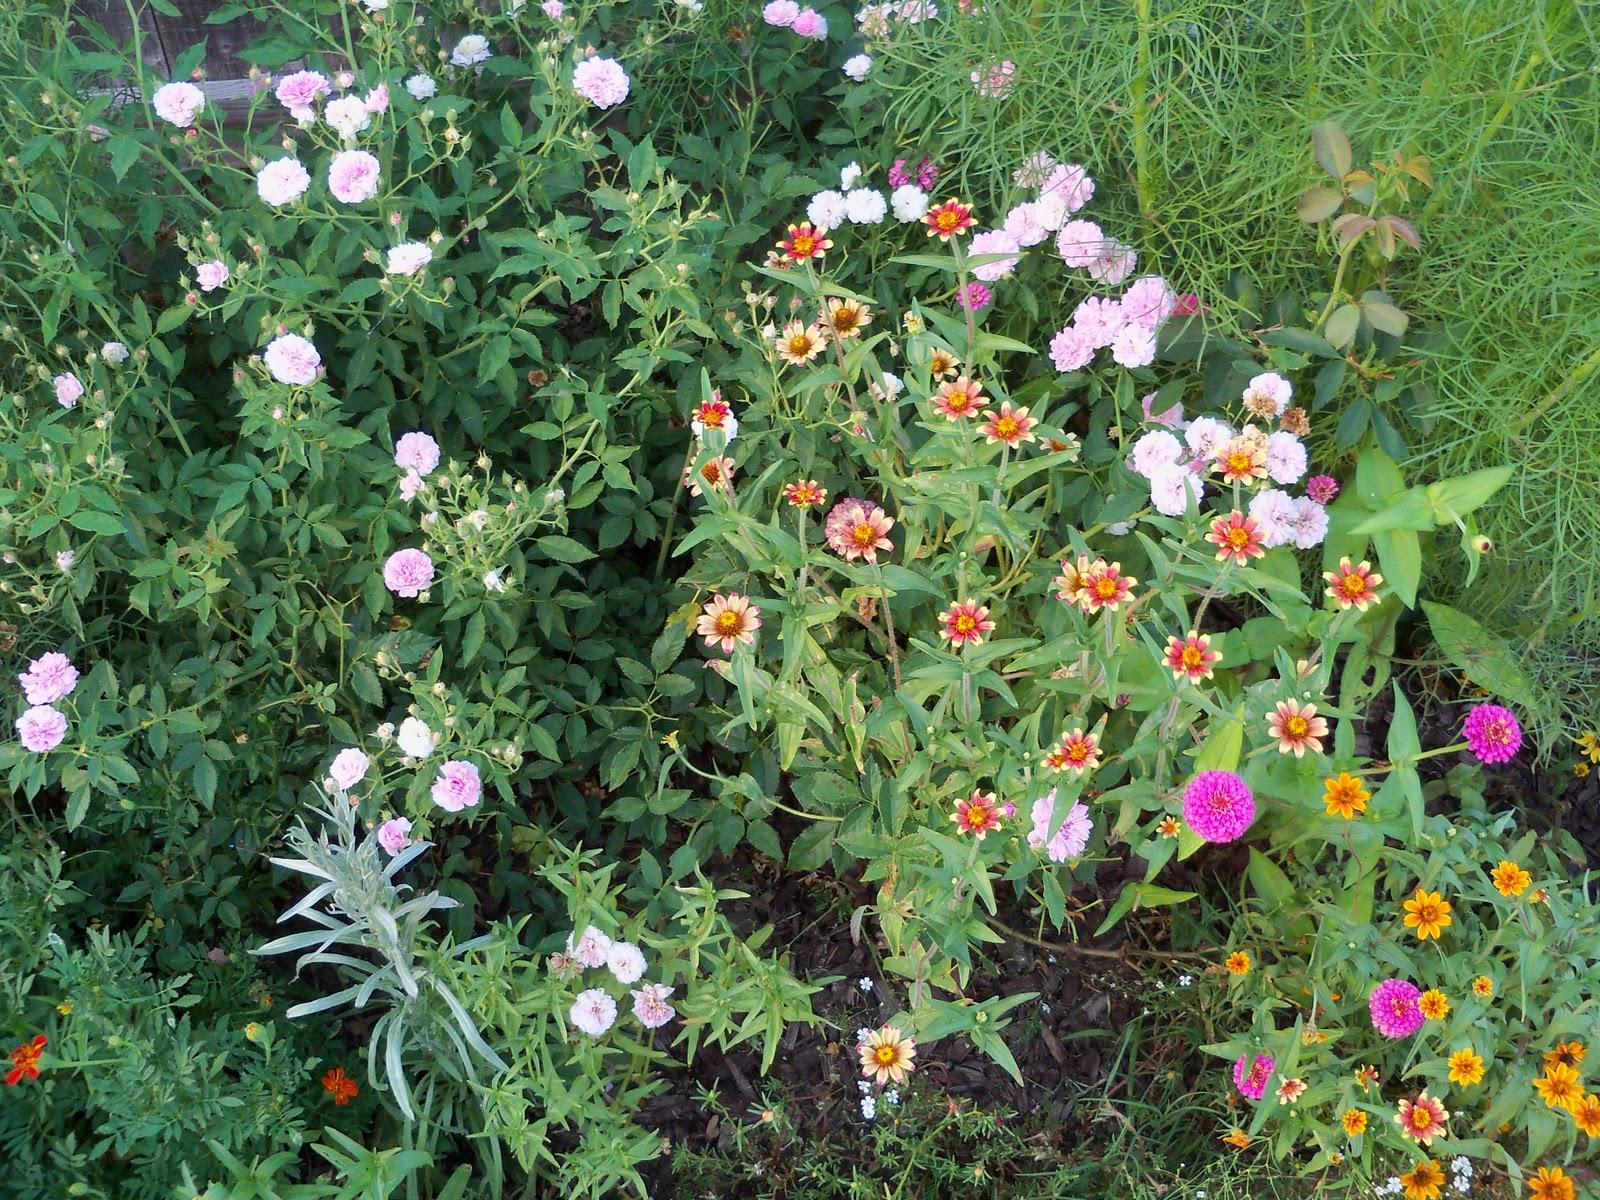 Gardening 2010, Part Three - 101_4307.JPG